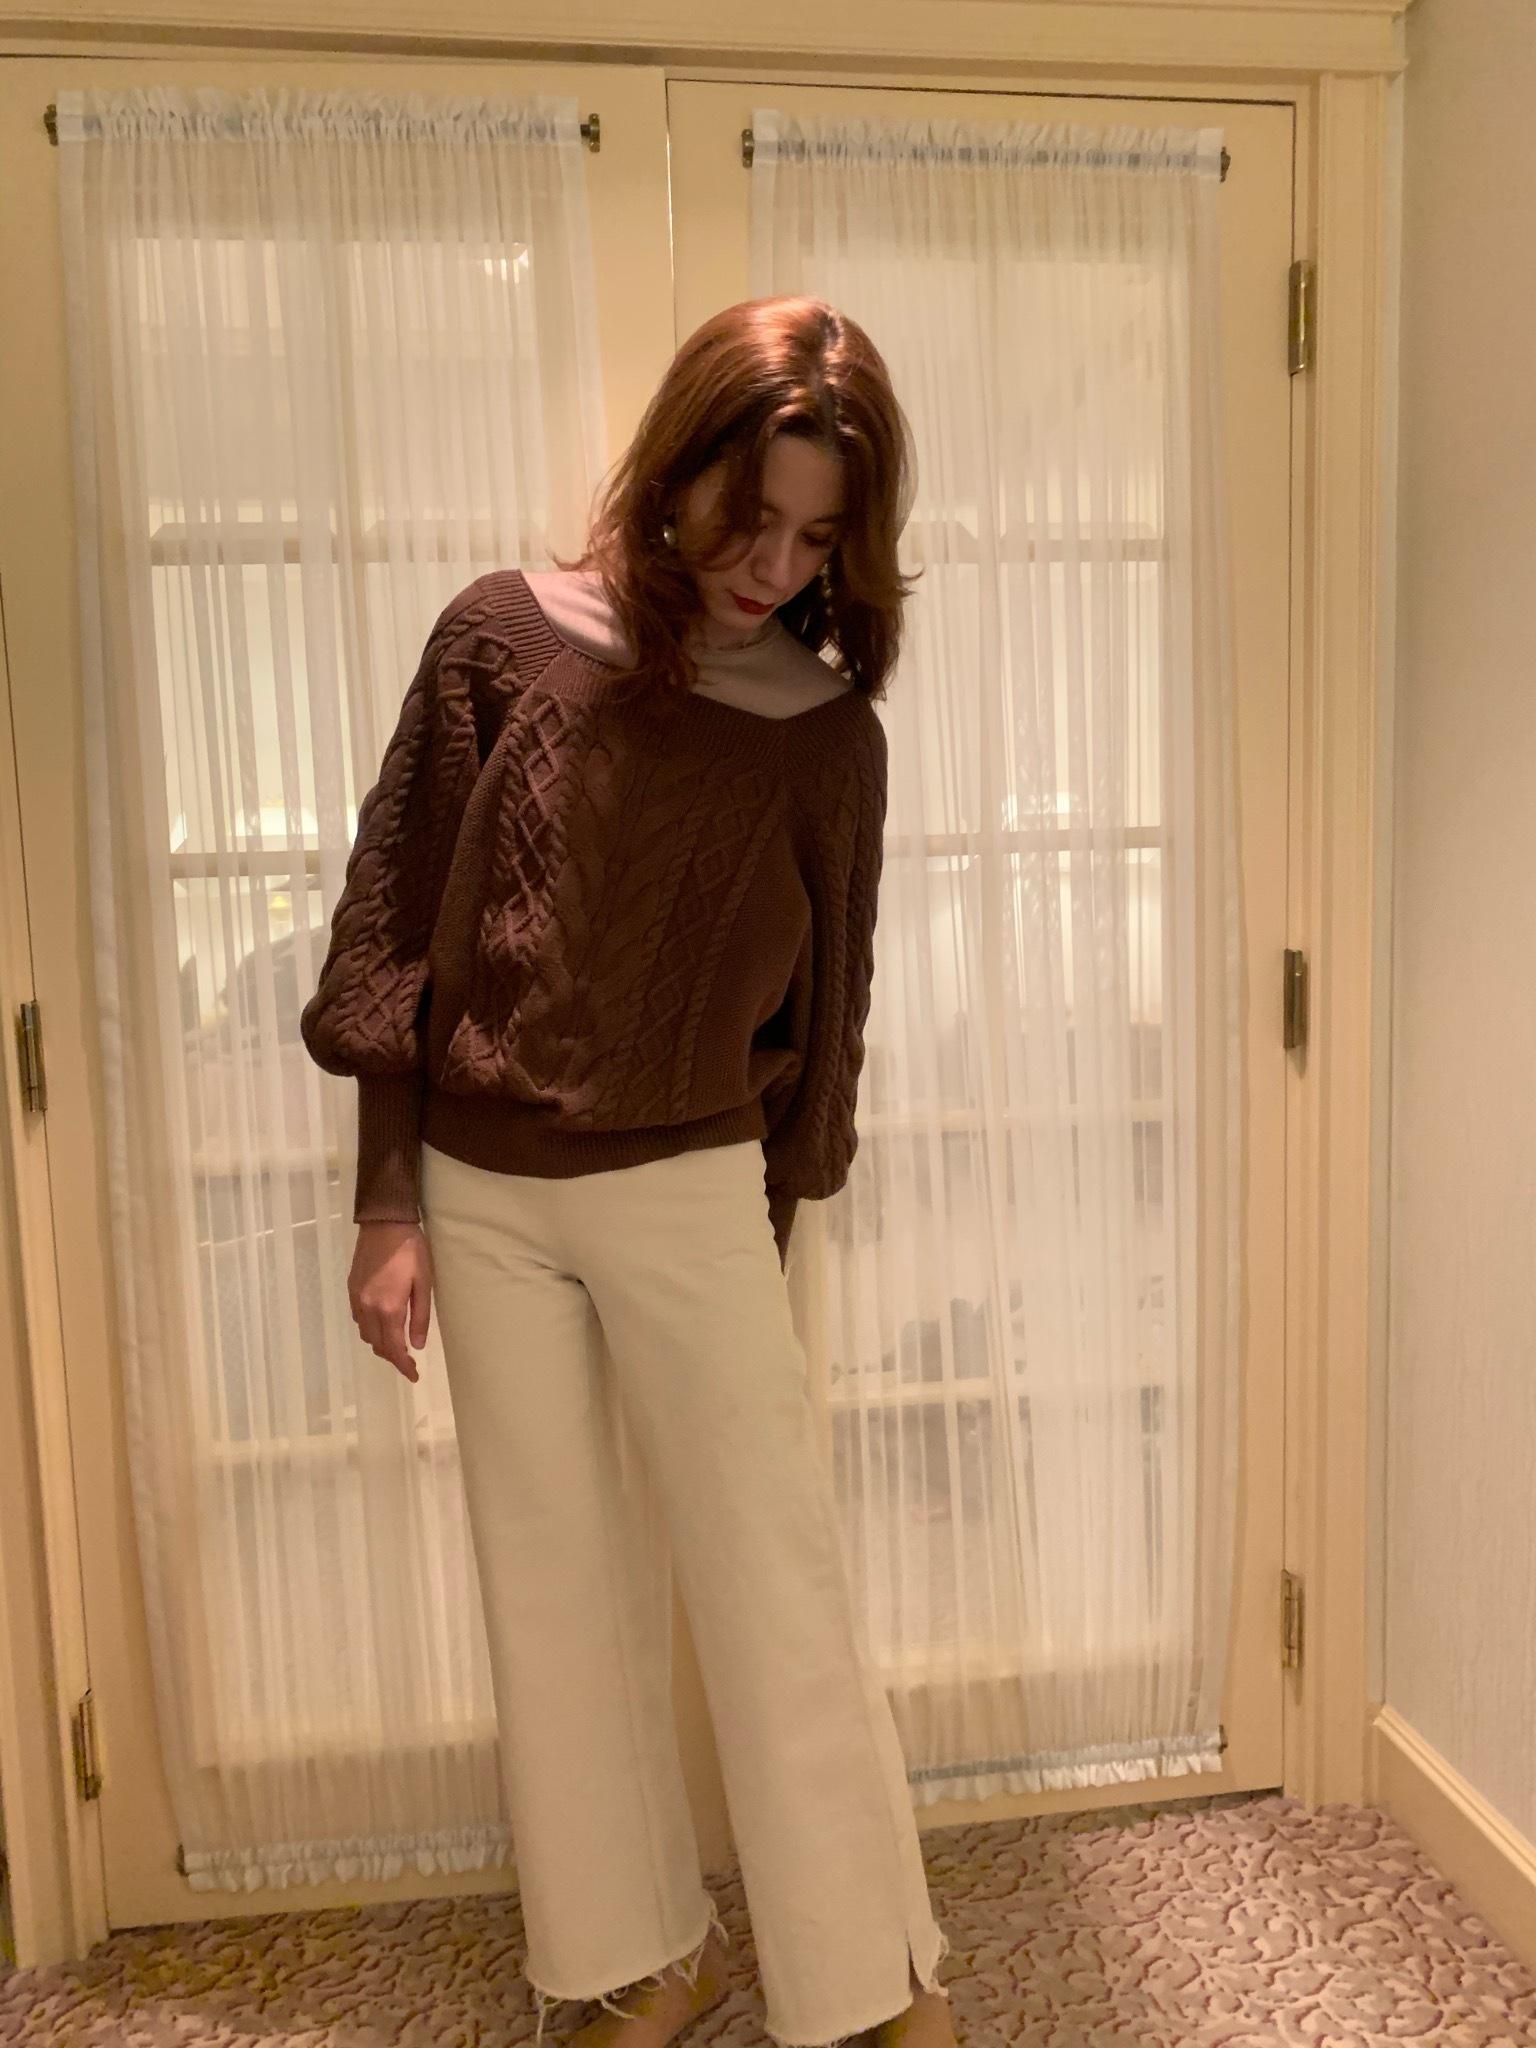 high-waist denim pants